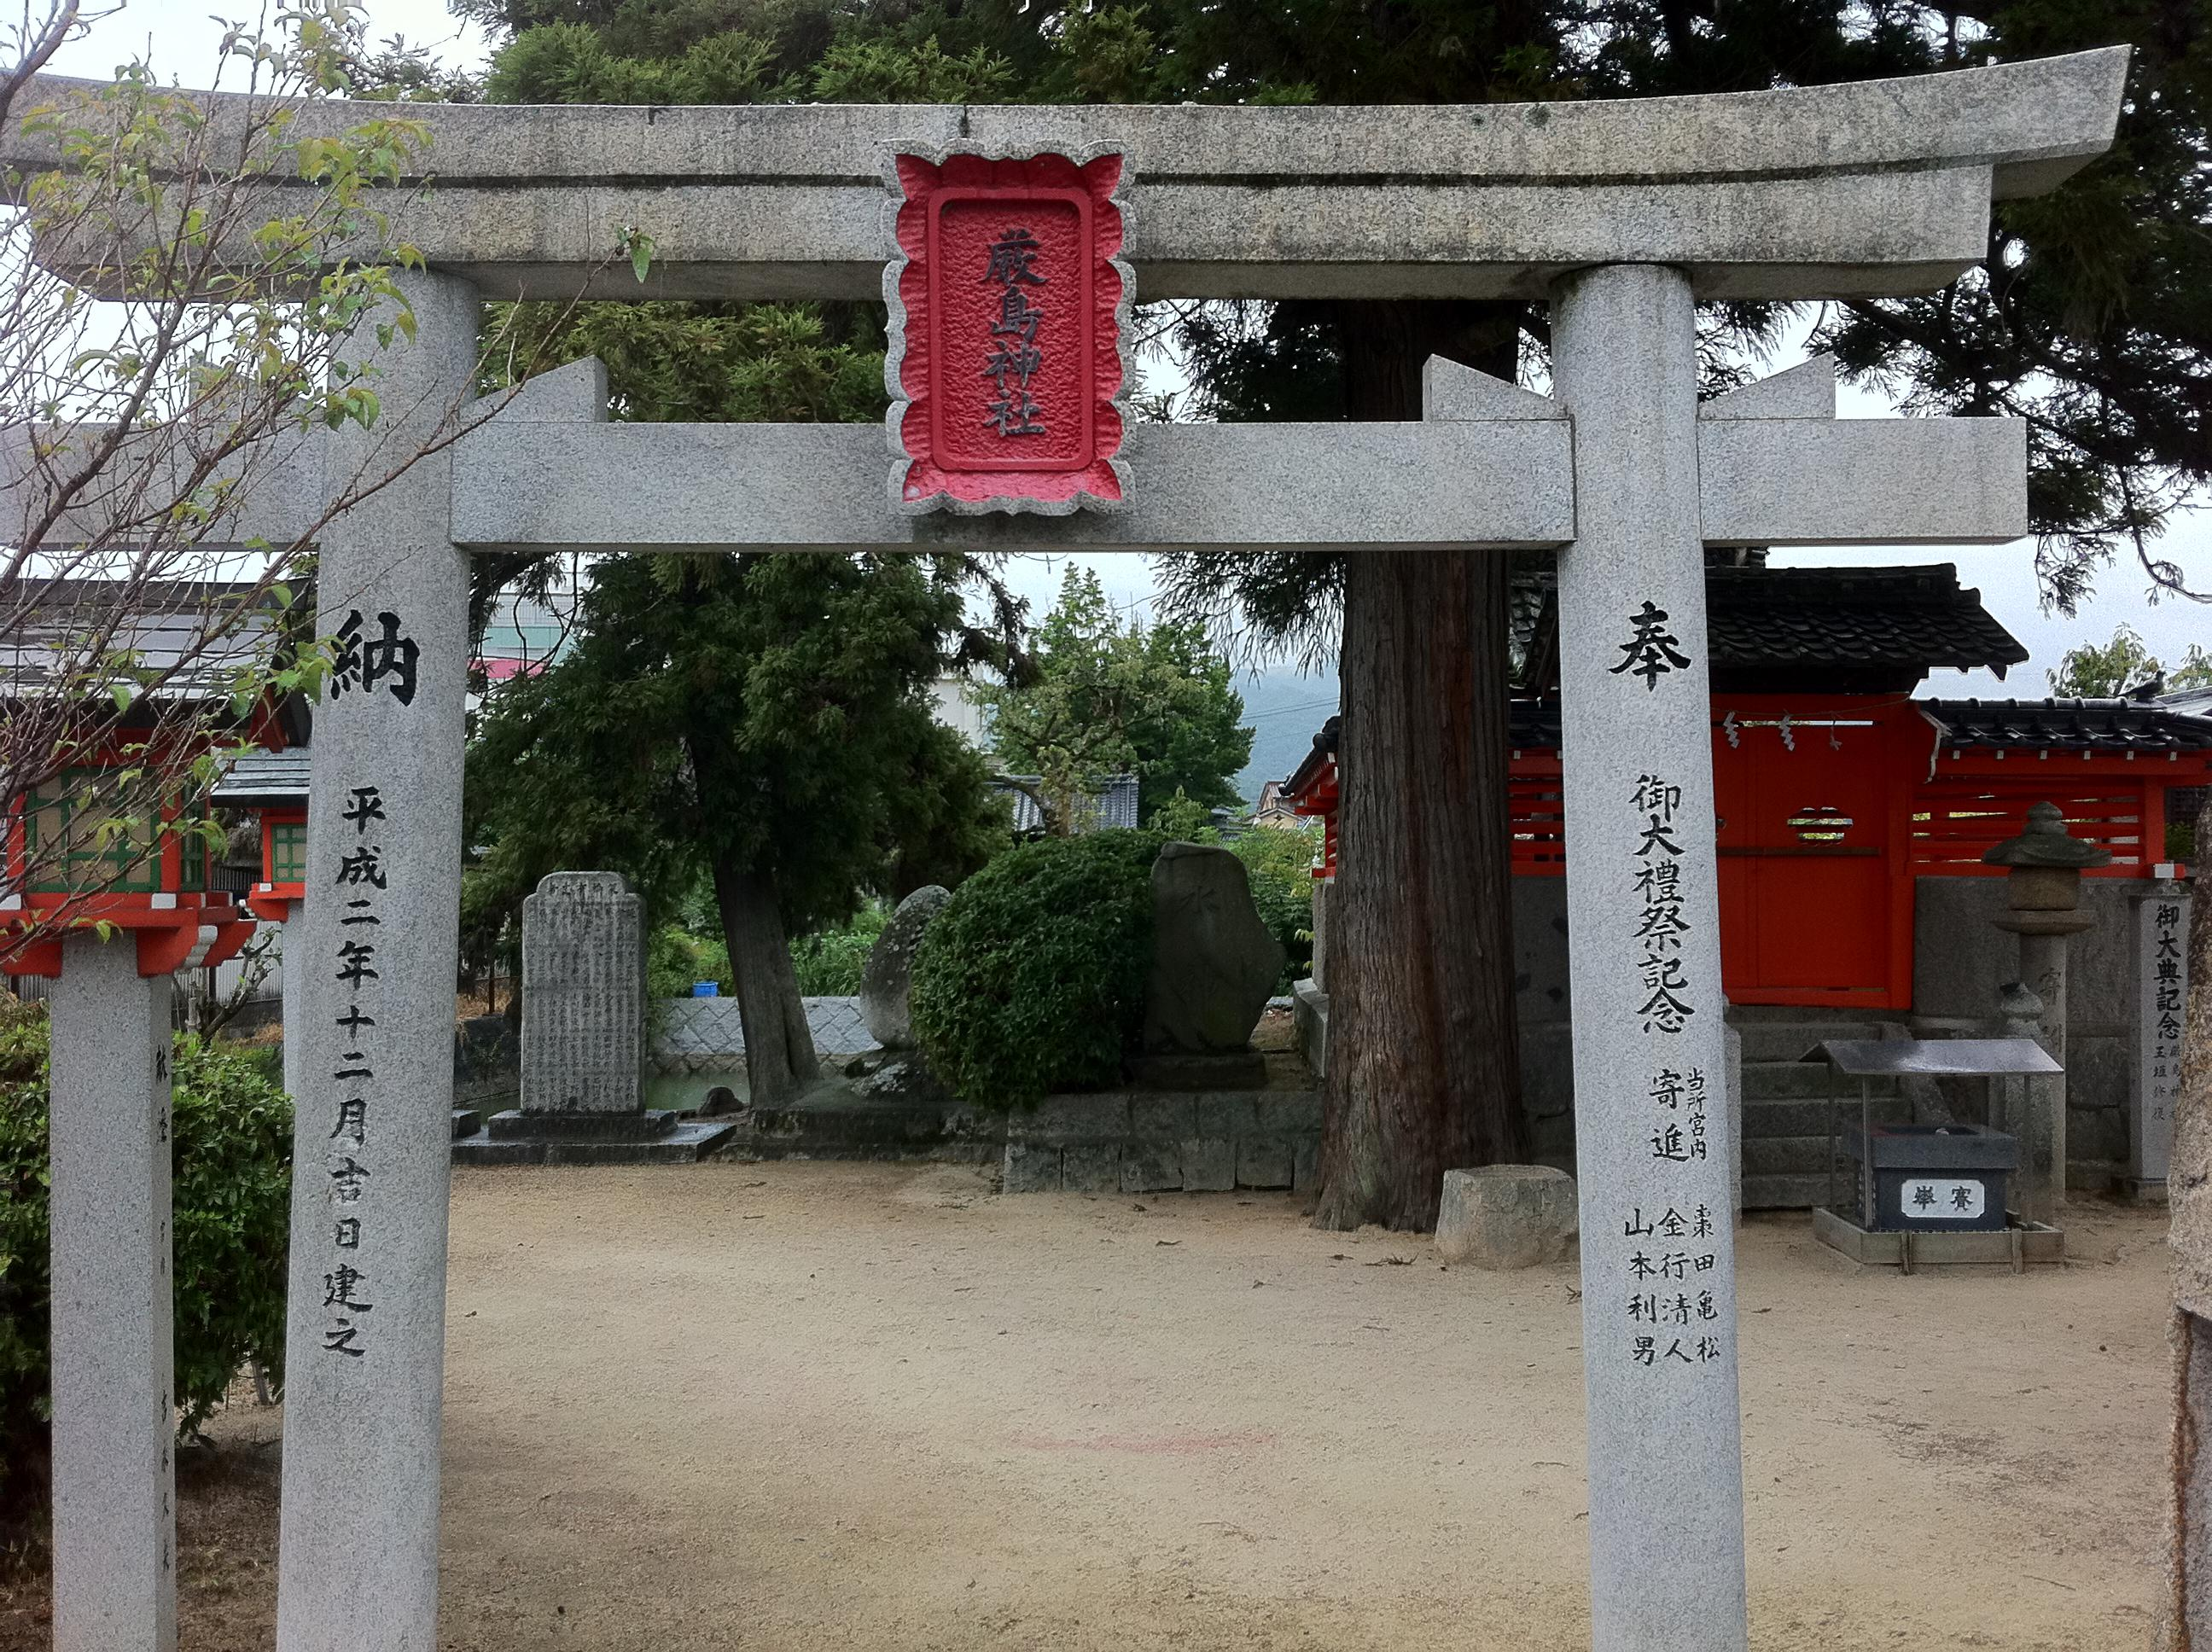 吉備津神社の鳥居